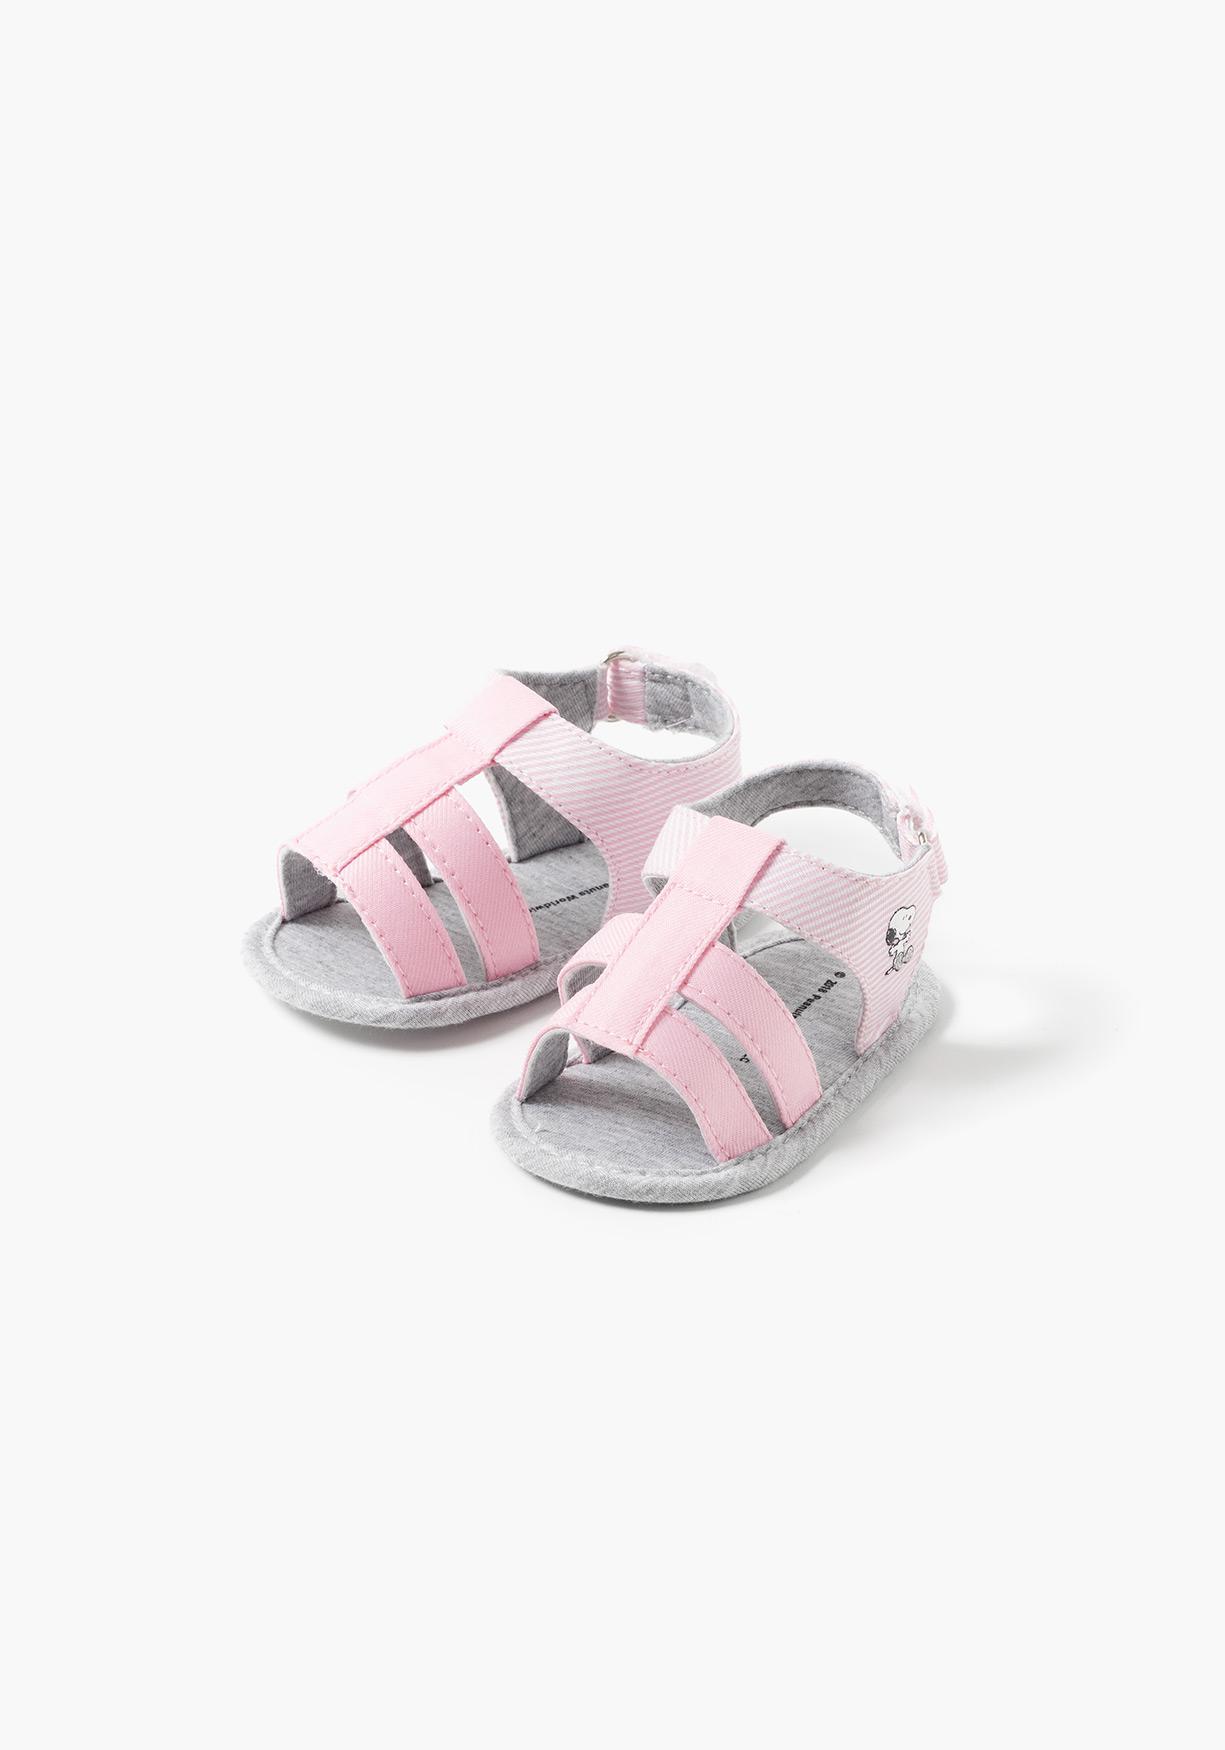 be96d823b Comprar Sandalias de recién nacido SNOOPY (Tallas 16 a 20 ...